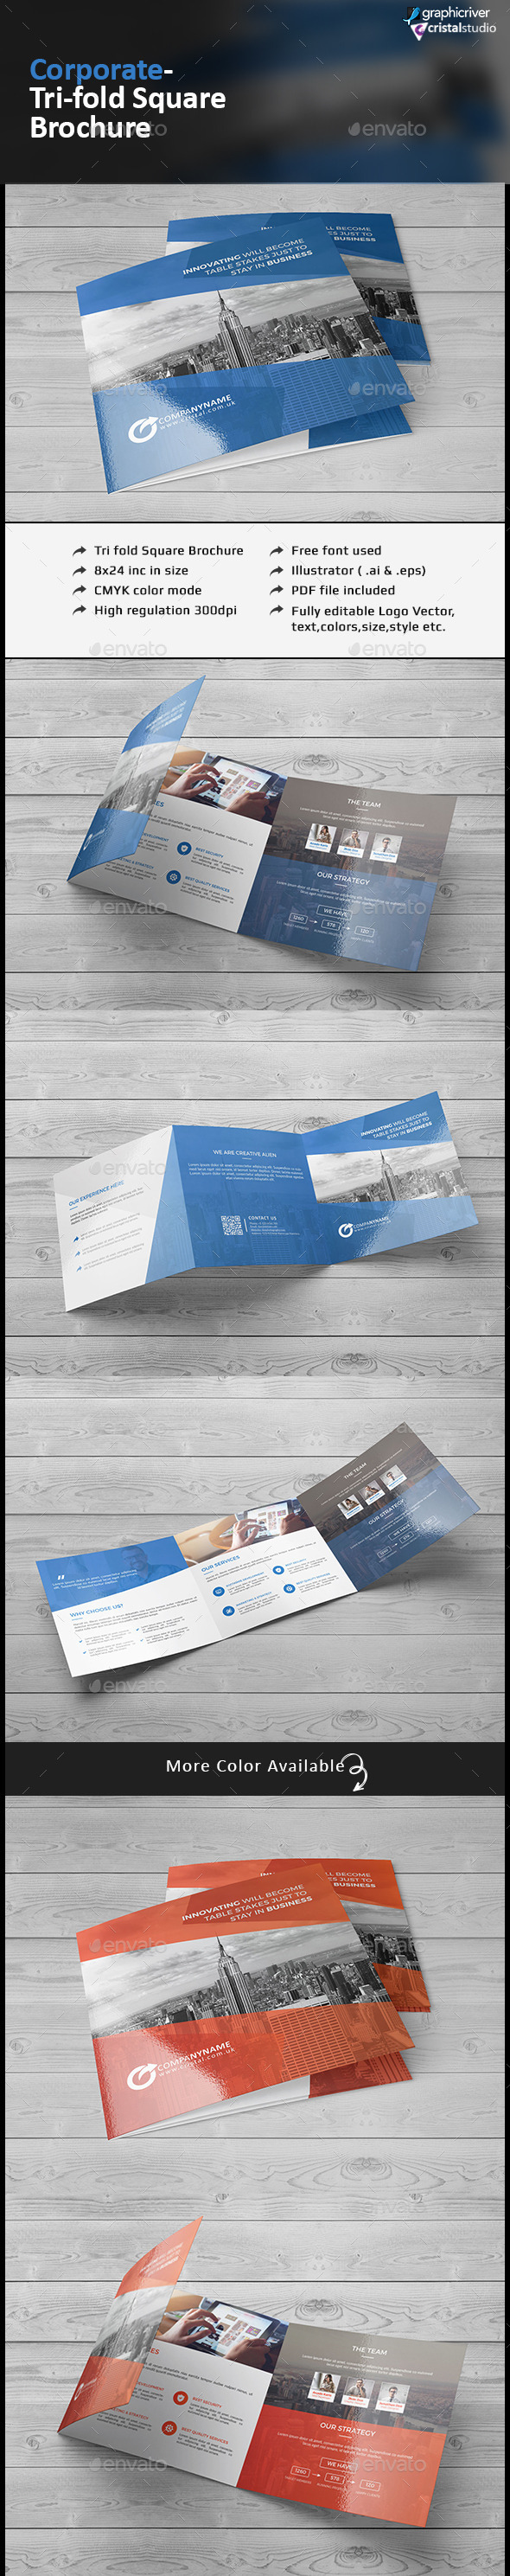 Tri fold Square Brochure - Corporate Brochures